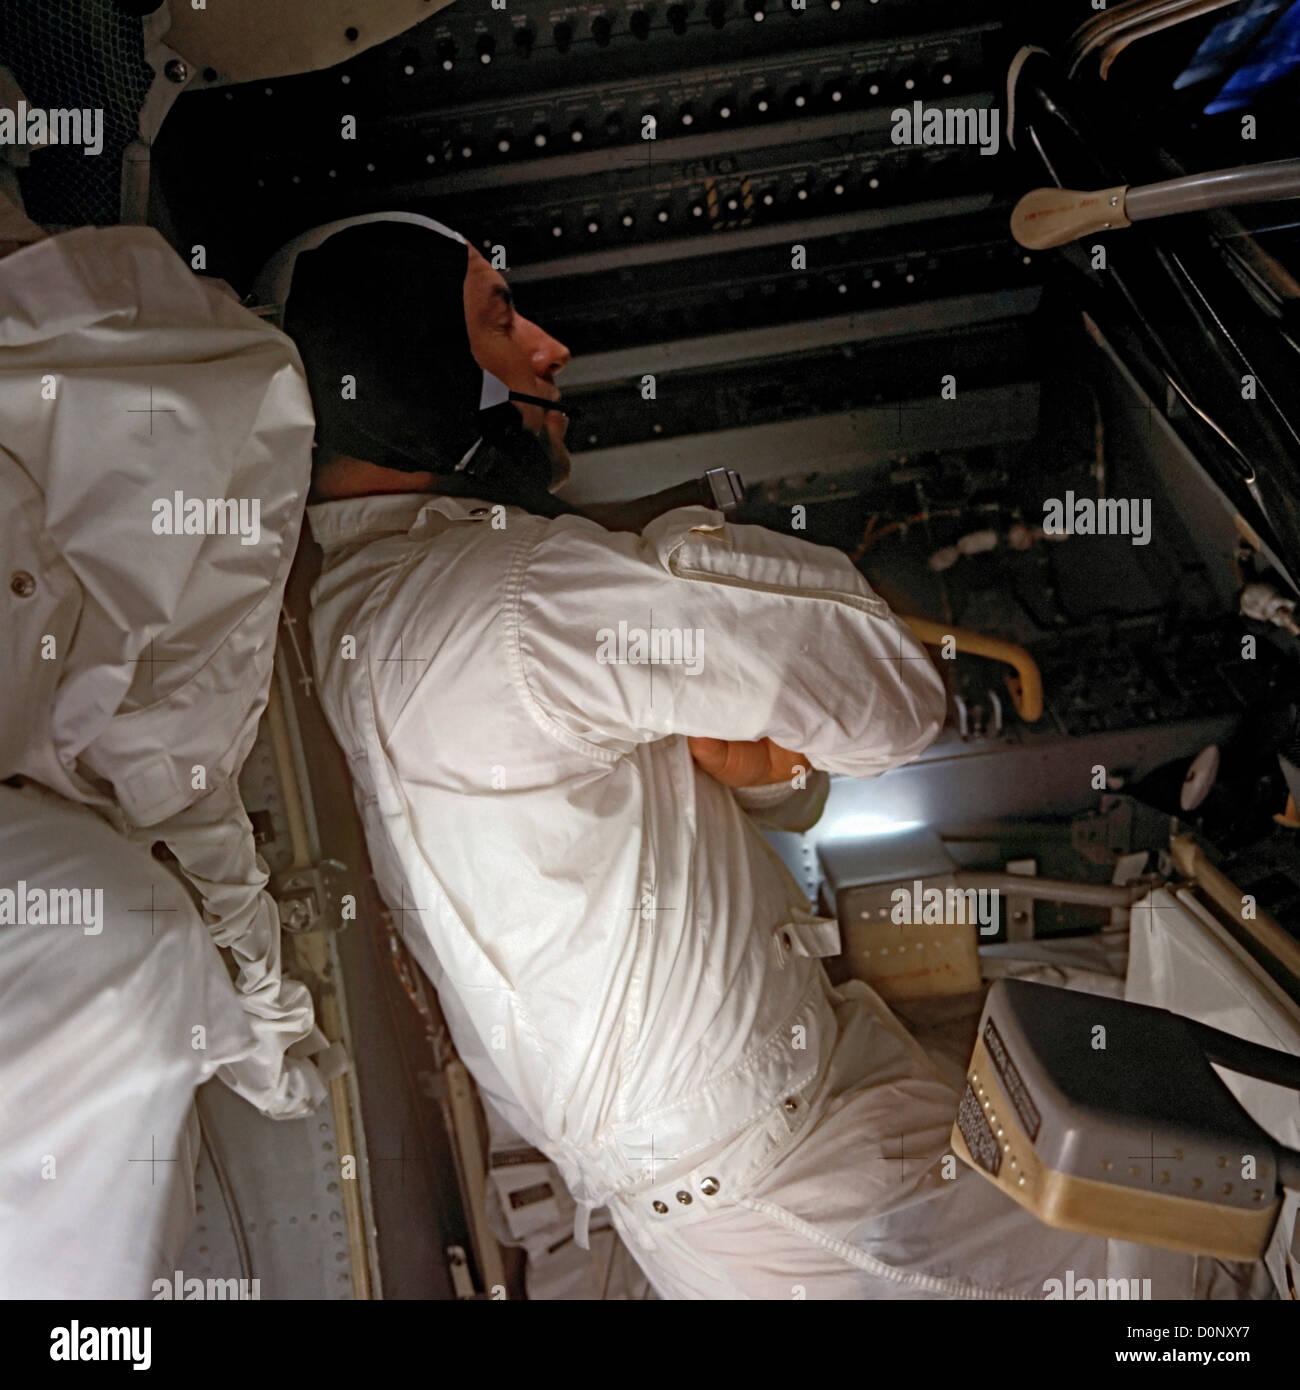 Apollo 13 - An Astronaut Sleeps - Stock Image